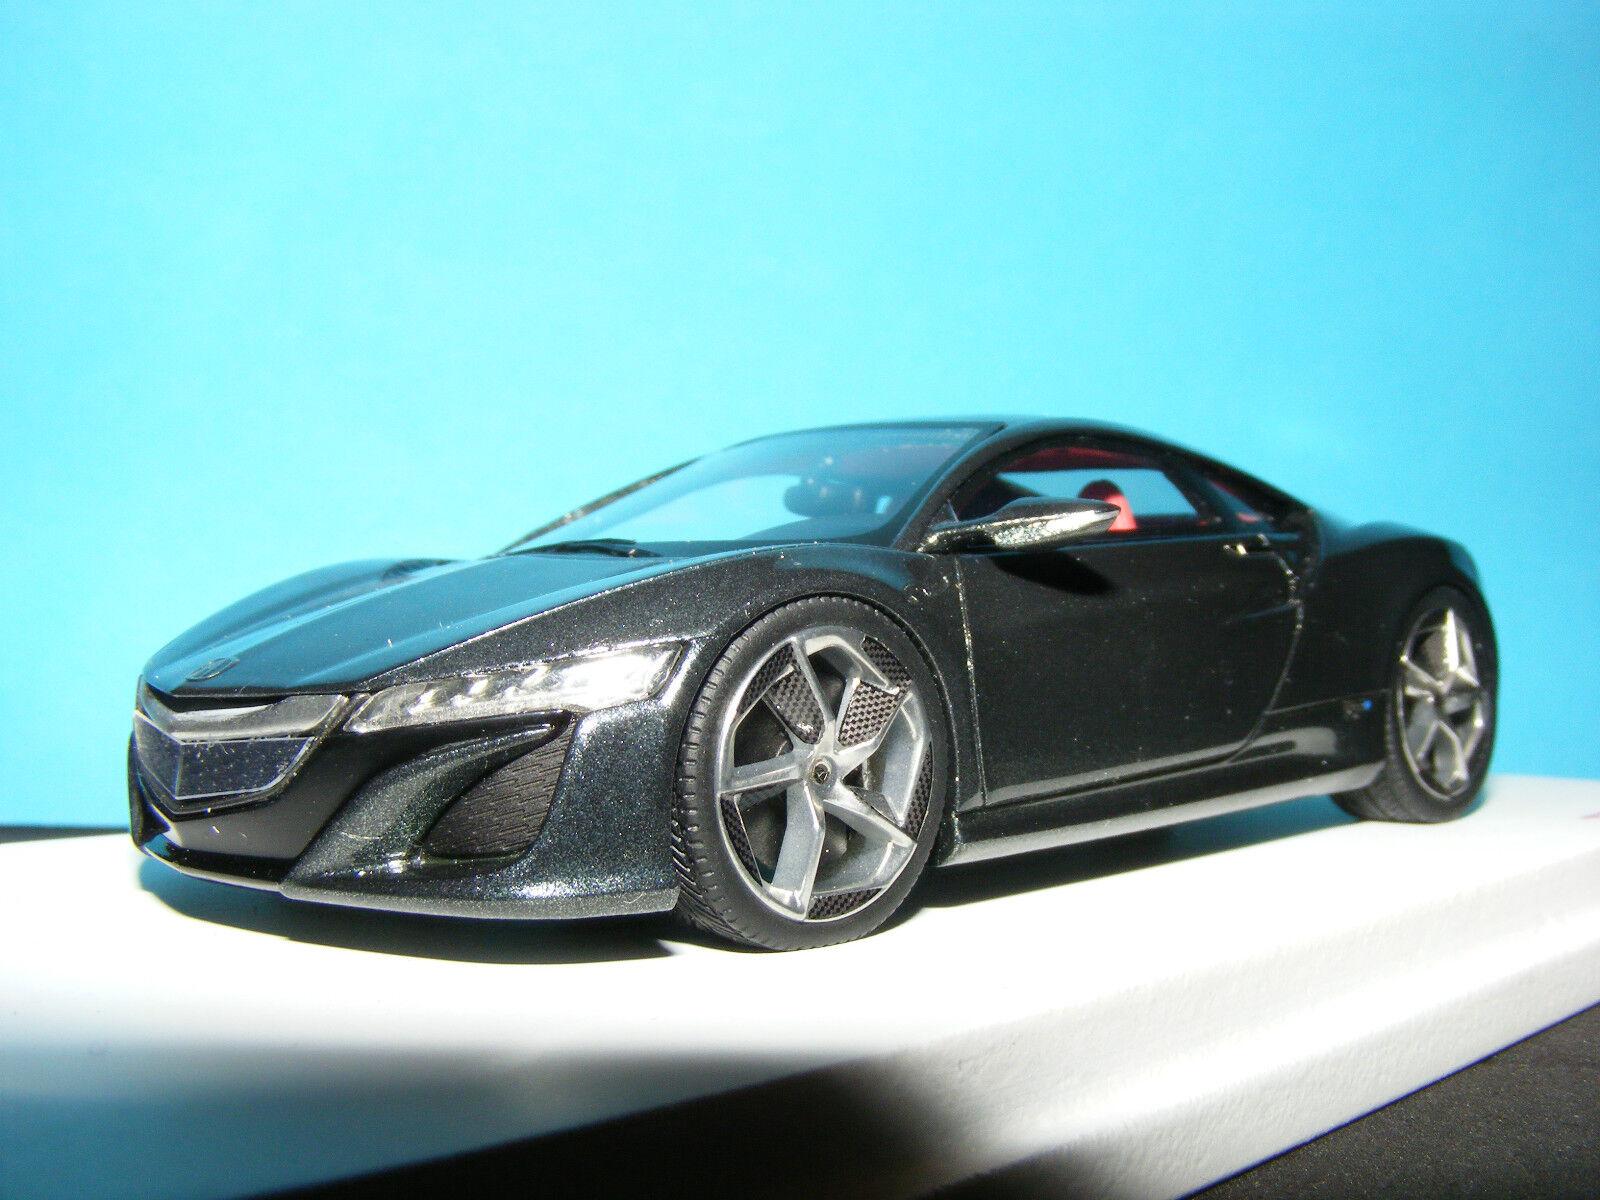 Honda Acura NSX Concept II 1 43 New True Scale assez rare N. American Auto Show.